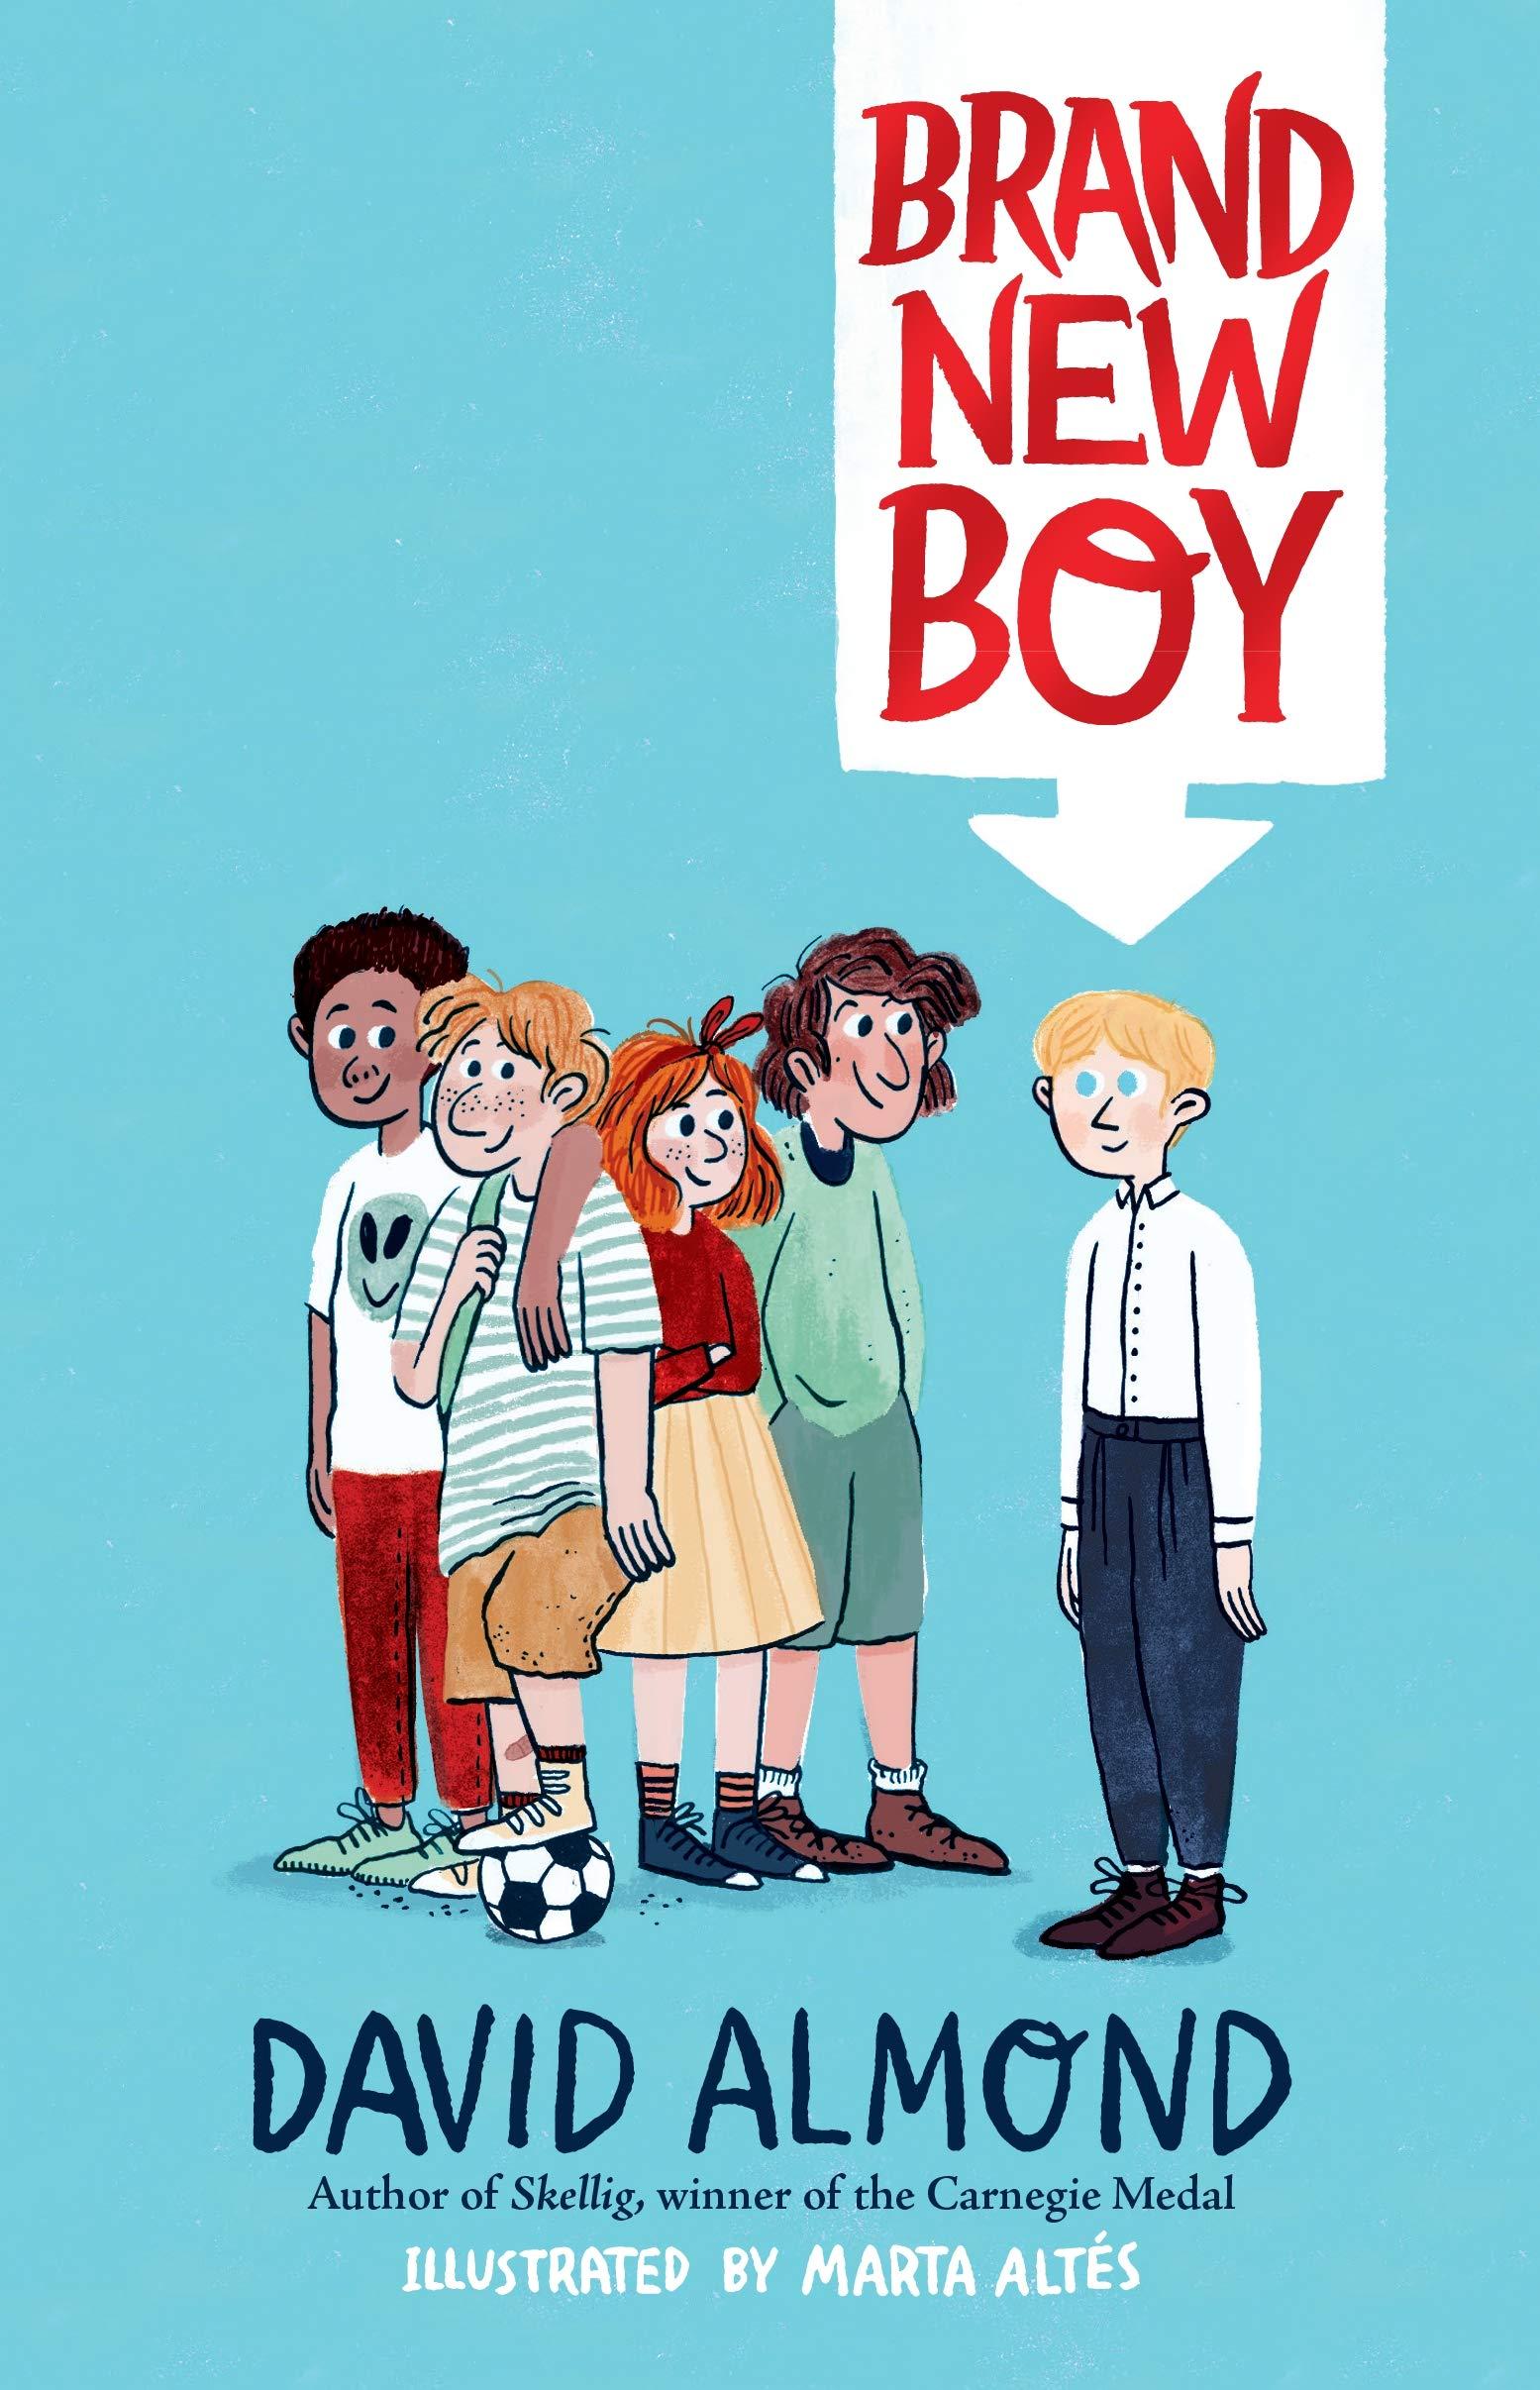 Brand New Boy: Amazon.co.uk: Almond, David, Altés, Marta: Books